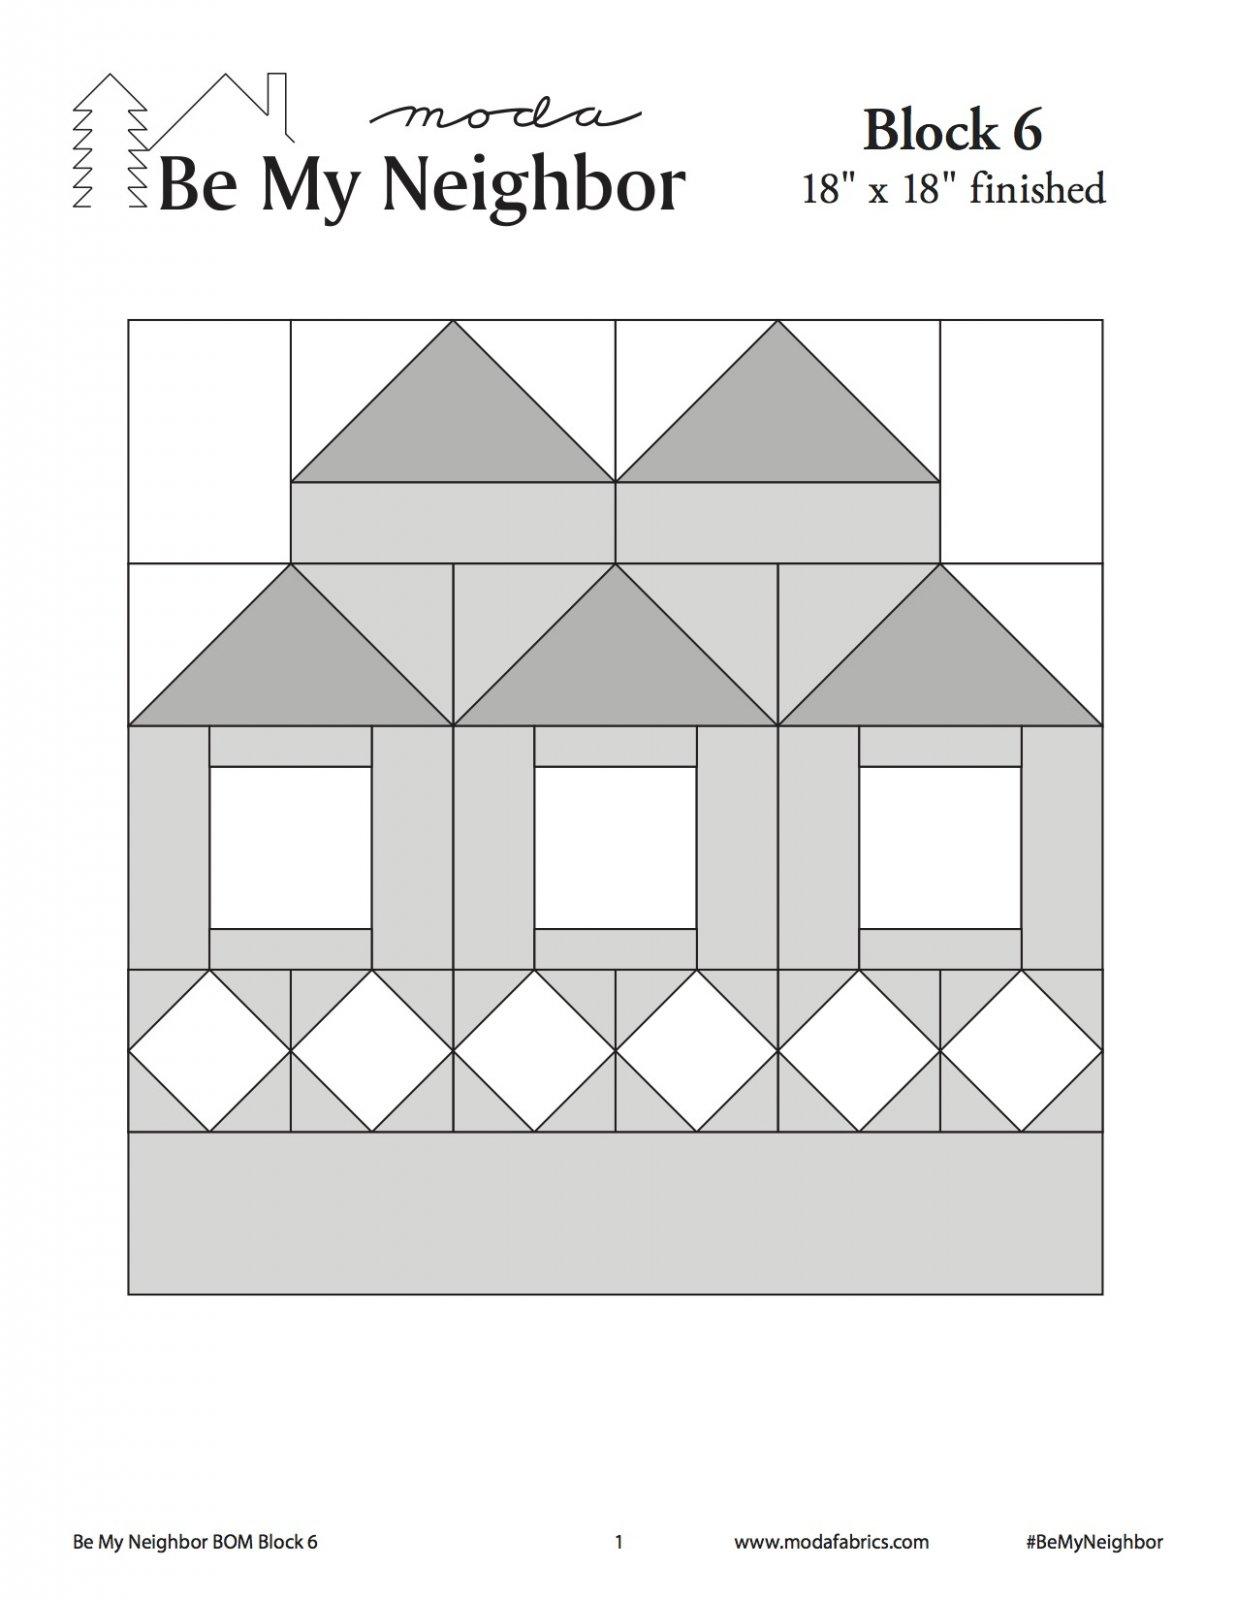 Be My Neighbor Quilt Along Block 6